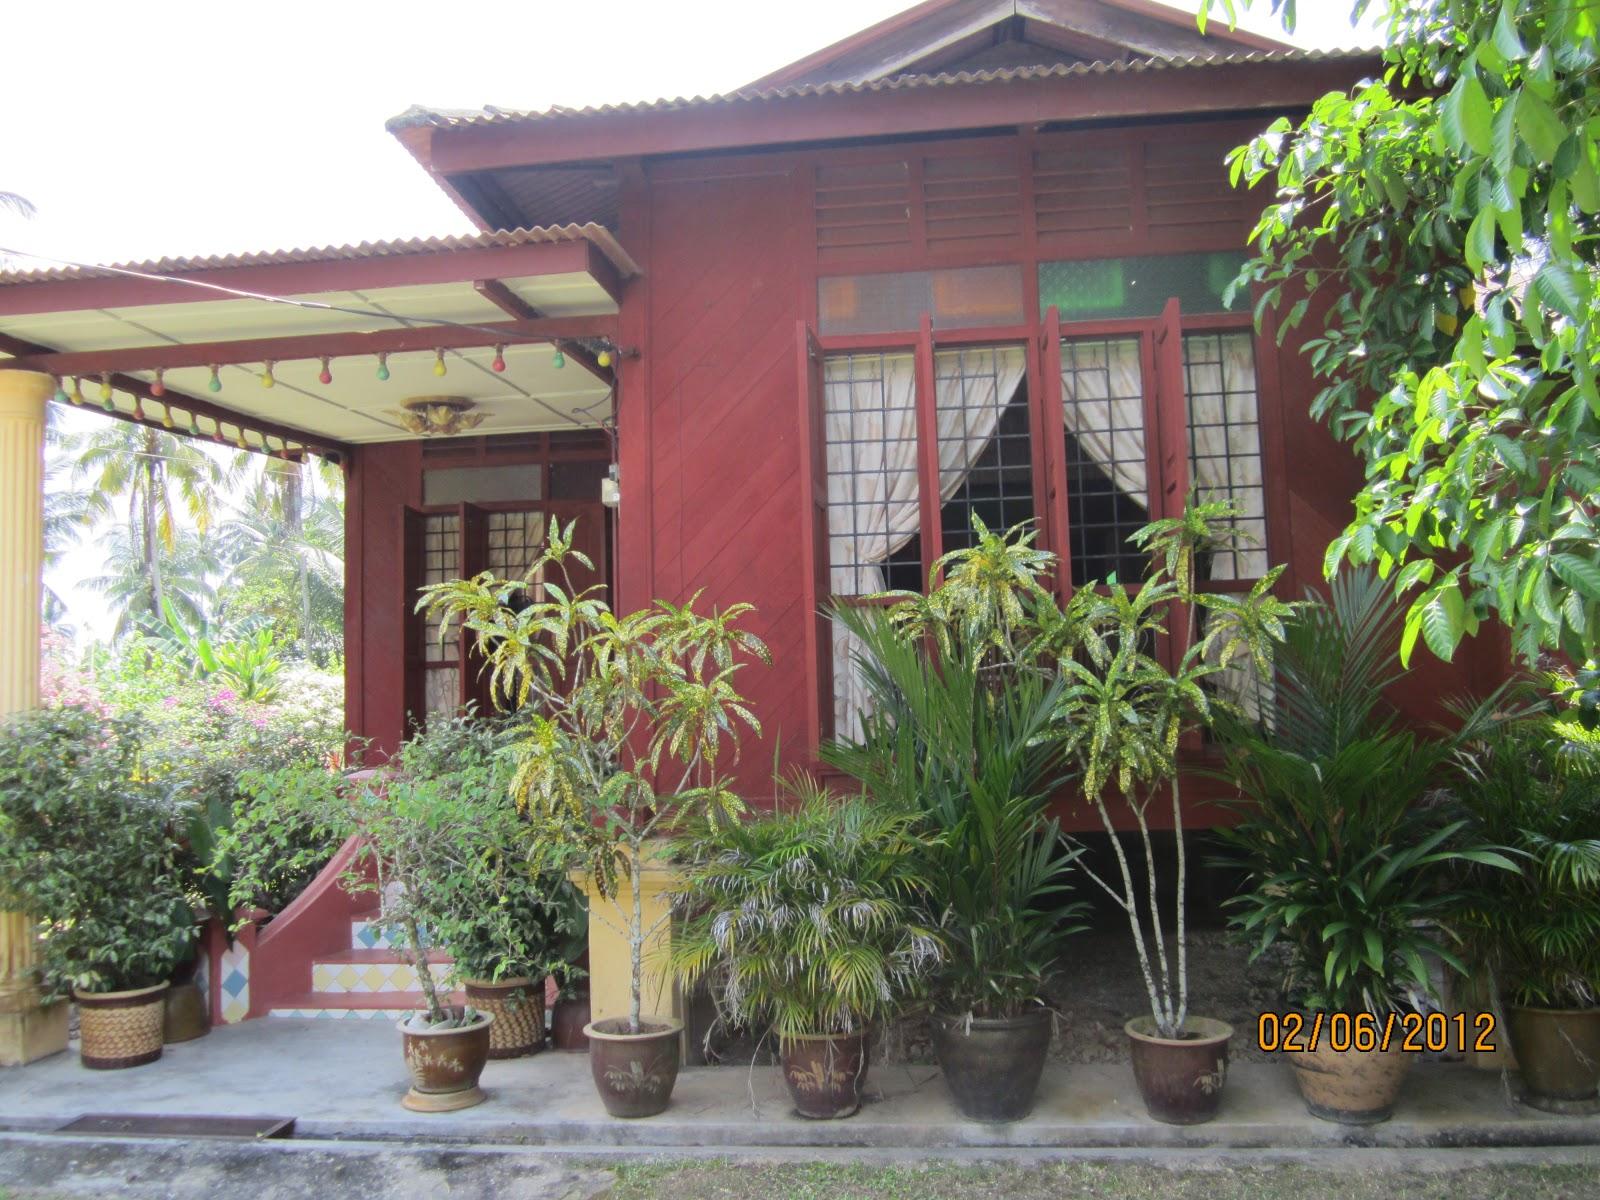 Ujang Kutik Negeri Sembilan Rumah Reka Bentuk Tradisional Di Sekitar Kota Chengkau